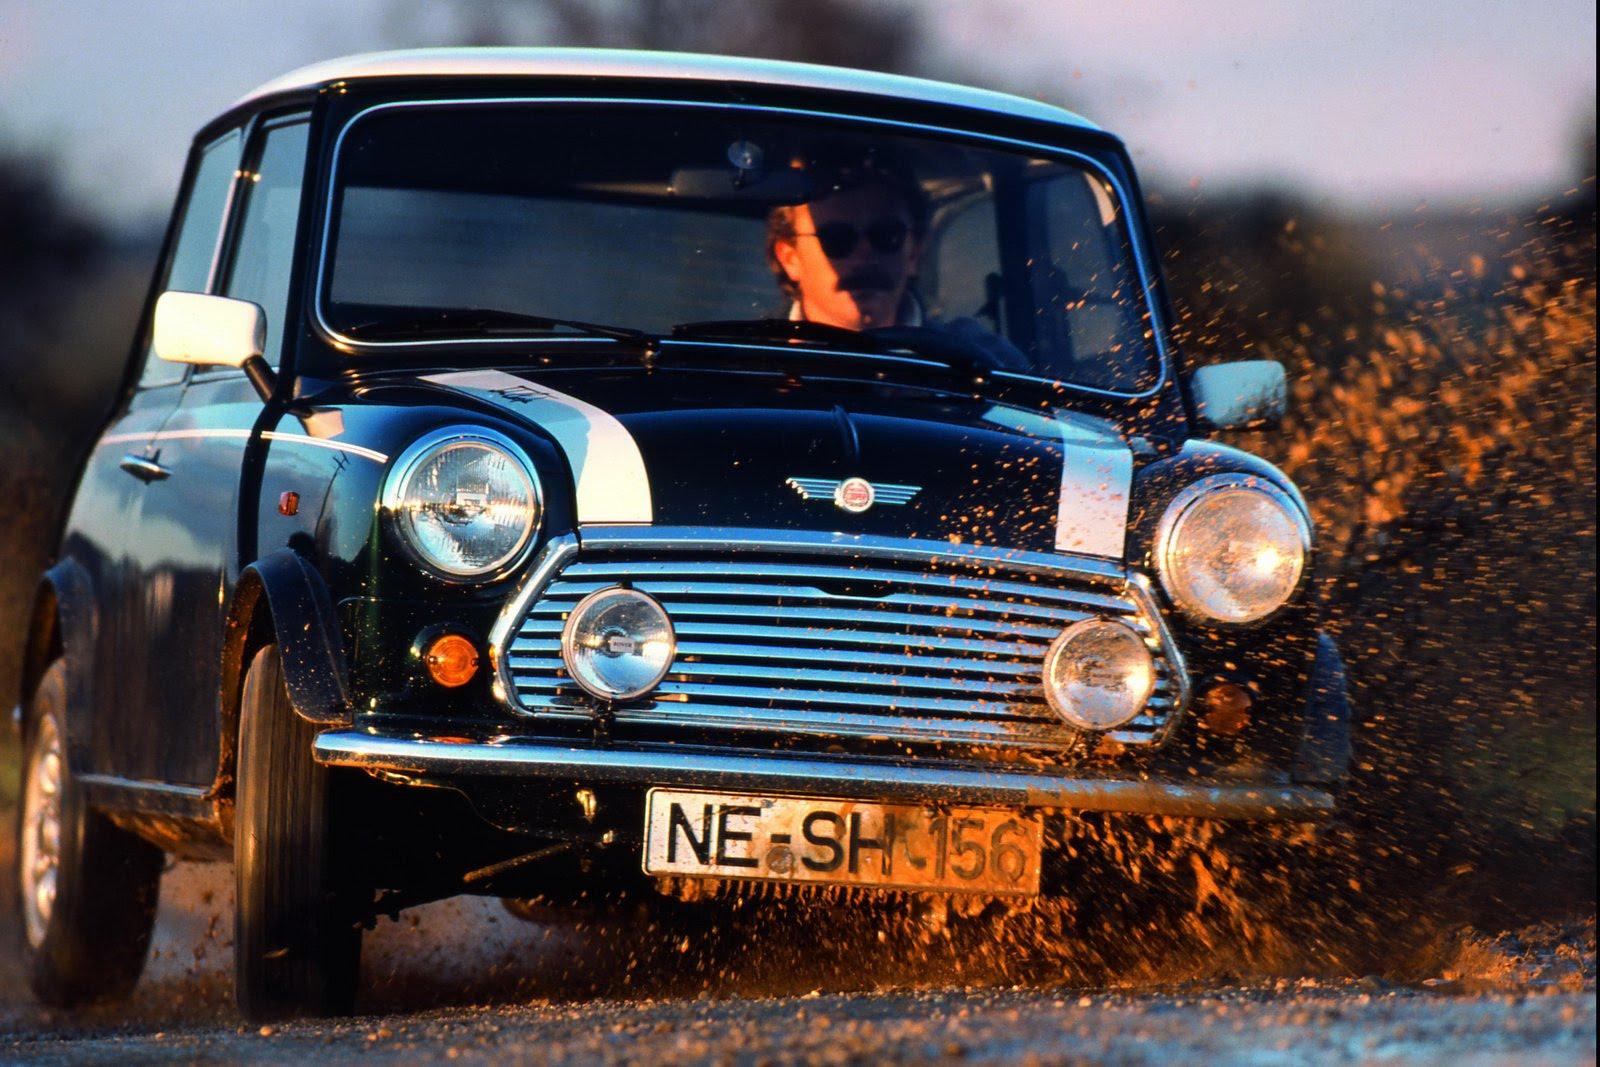 Antique Cars Wallpaper Hd Mini Cooper 1959 Photo Gallery Inspirationseek Com